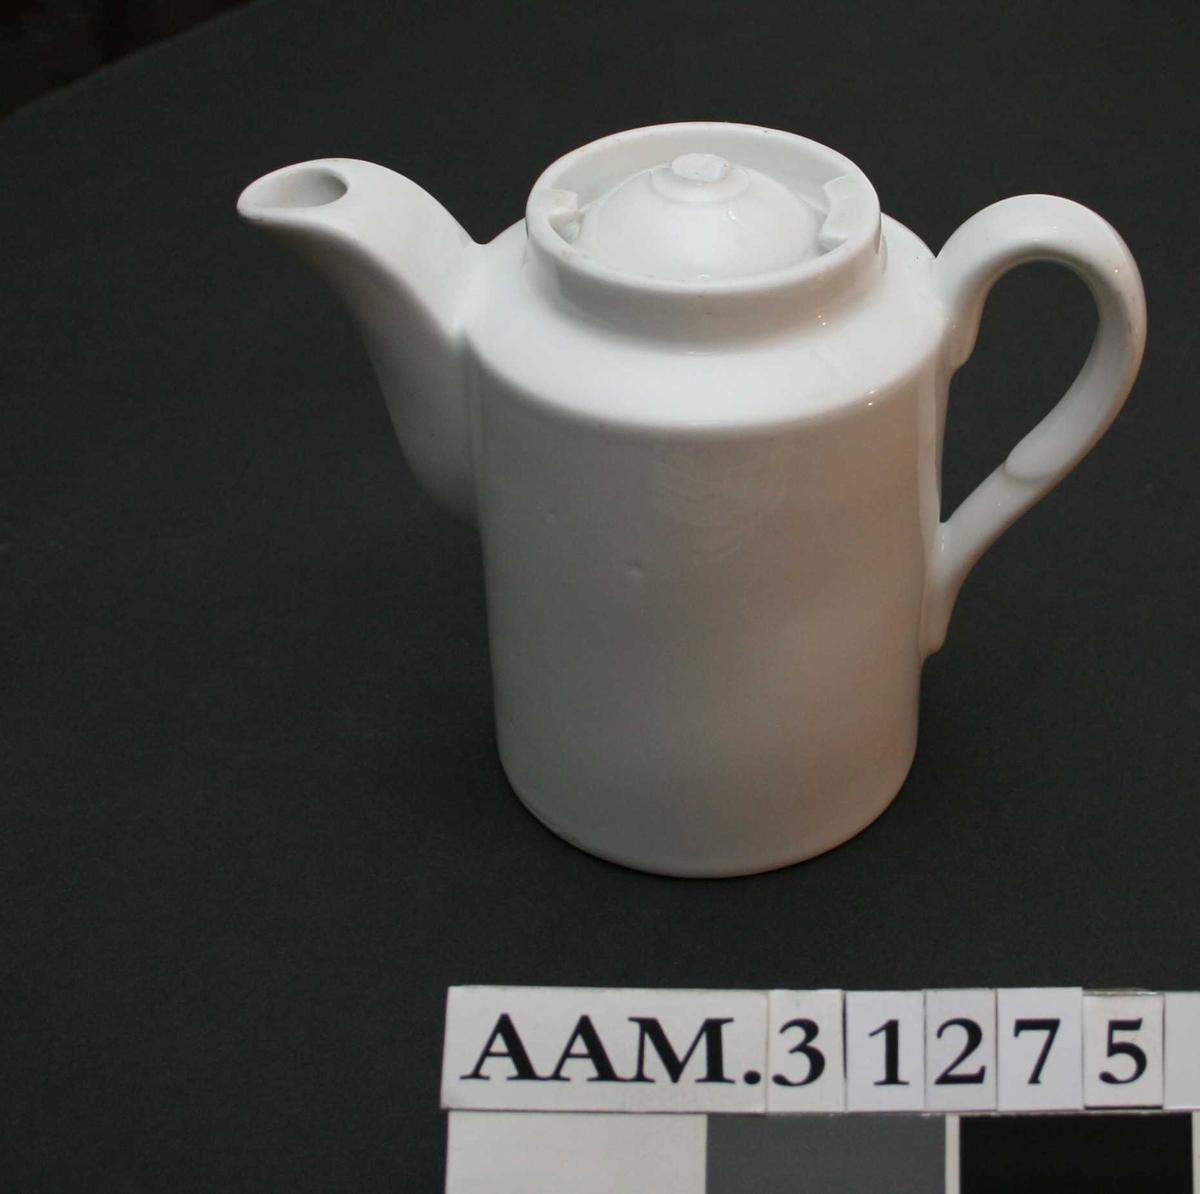 Liten, sylinderformet kaffekanne med lokk.